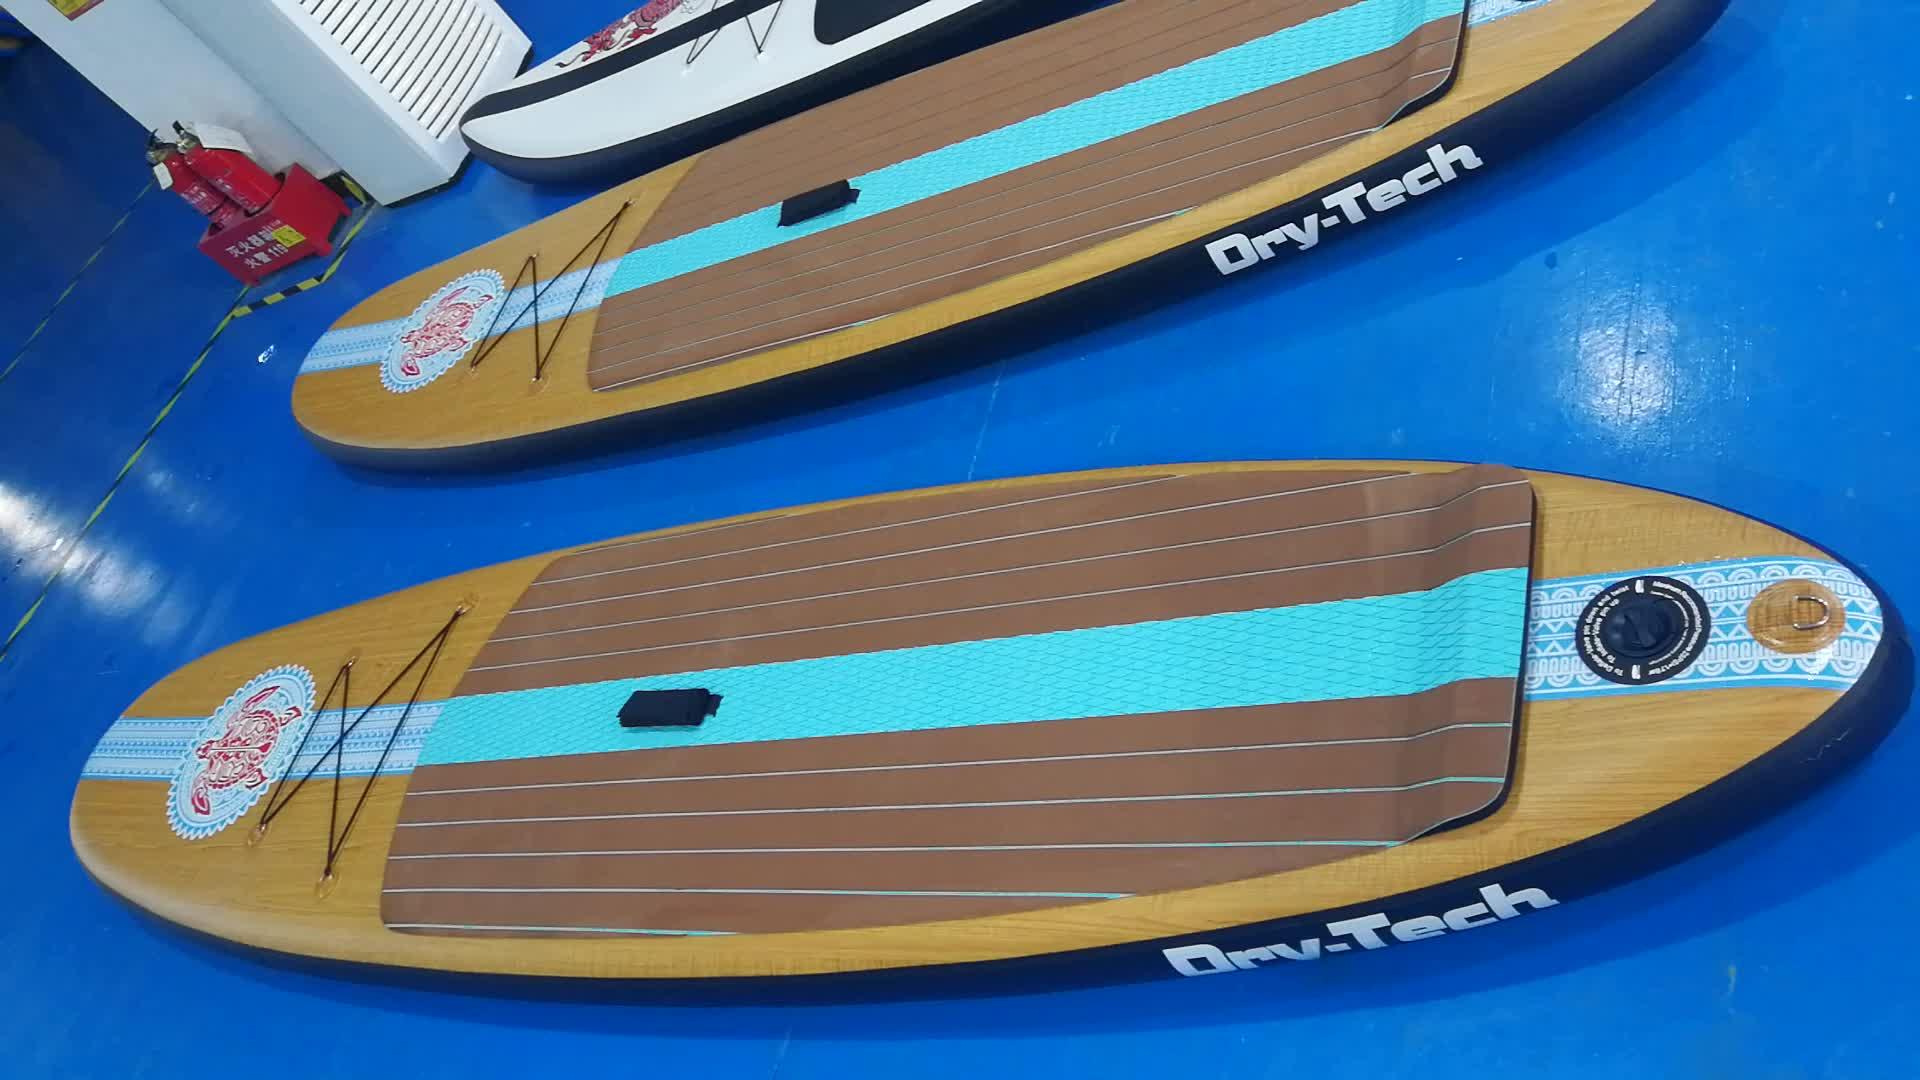 China fabrikant surfplank stand up paddle board opblaasbare sup board voor verkoop